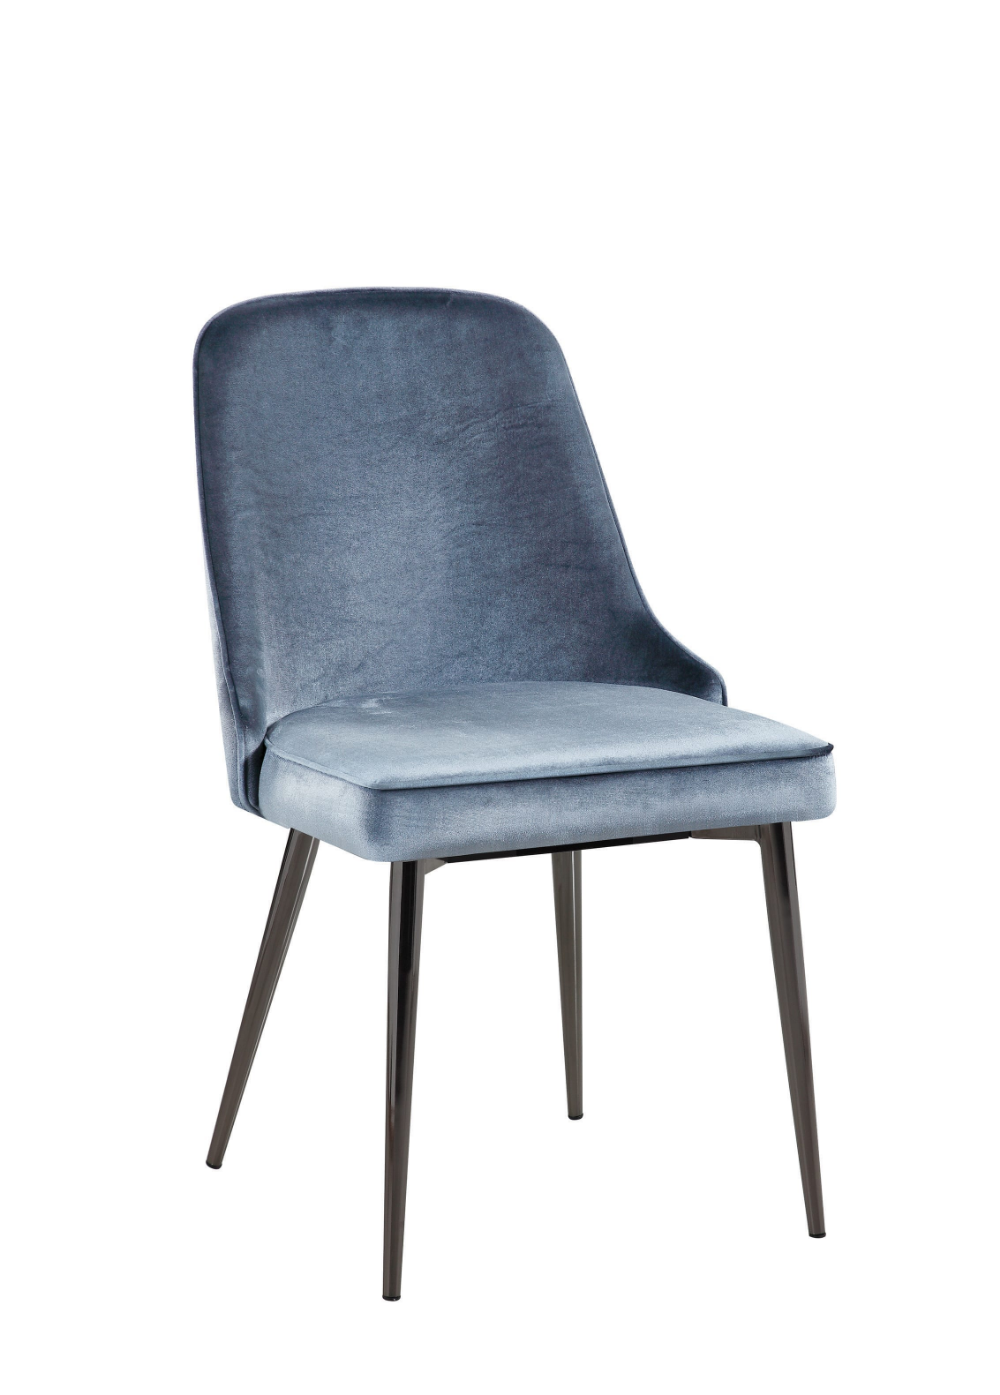 Scott Living Inslee Contemporary Blue Dining Chair Coaster Fine